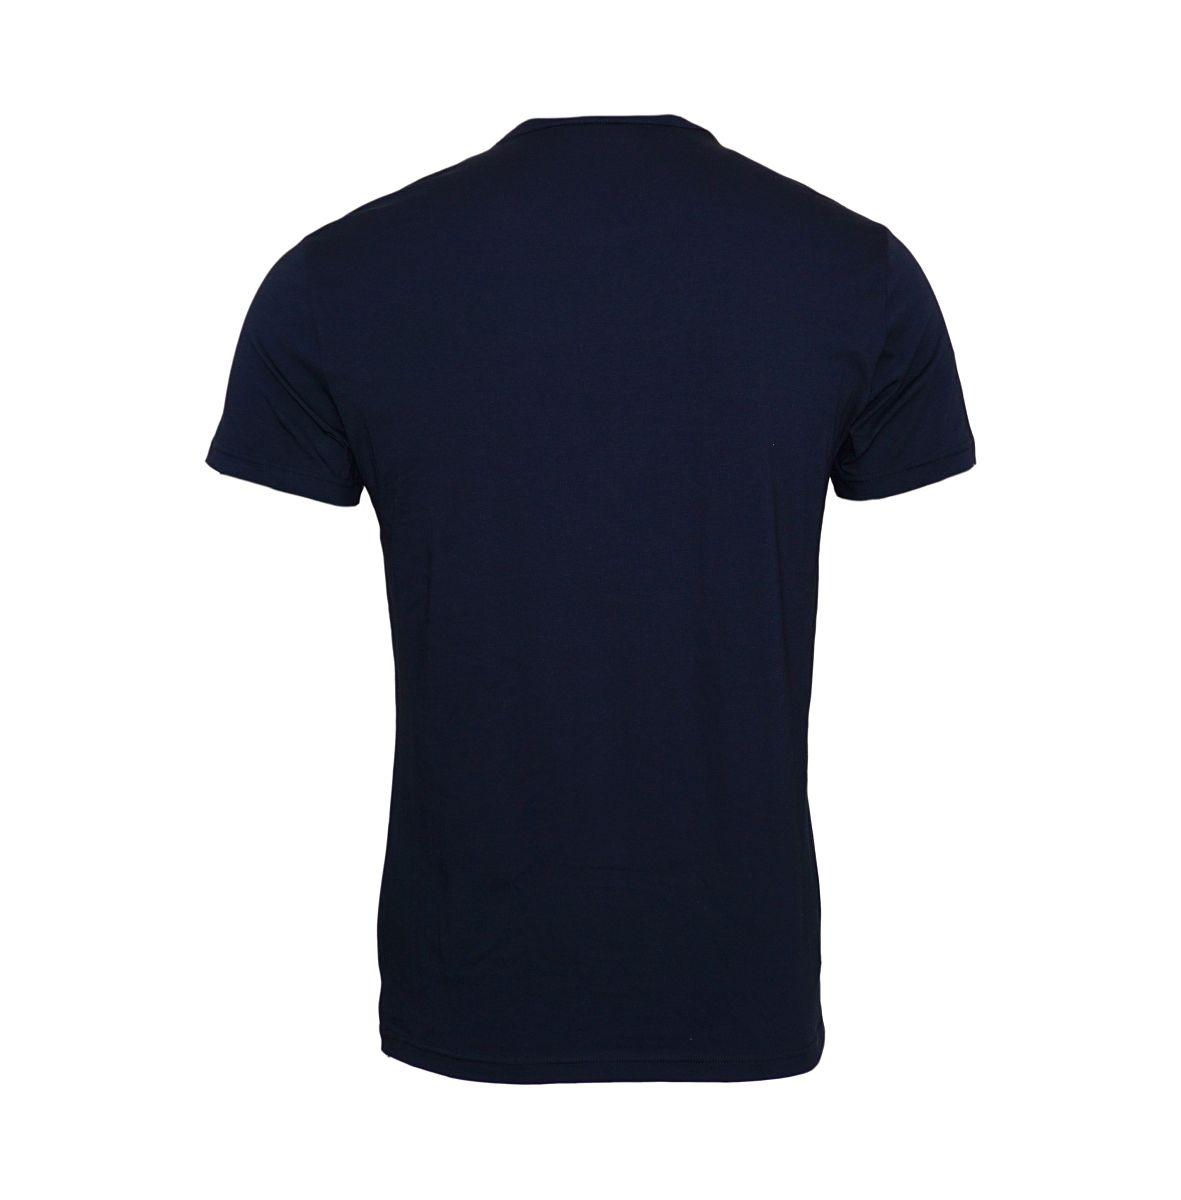 Emporio Armani 2er Pack T-Shirts Rundhals 111267 8P717 18735 MARINE/CIELO W18-EATS1